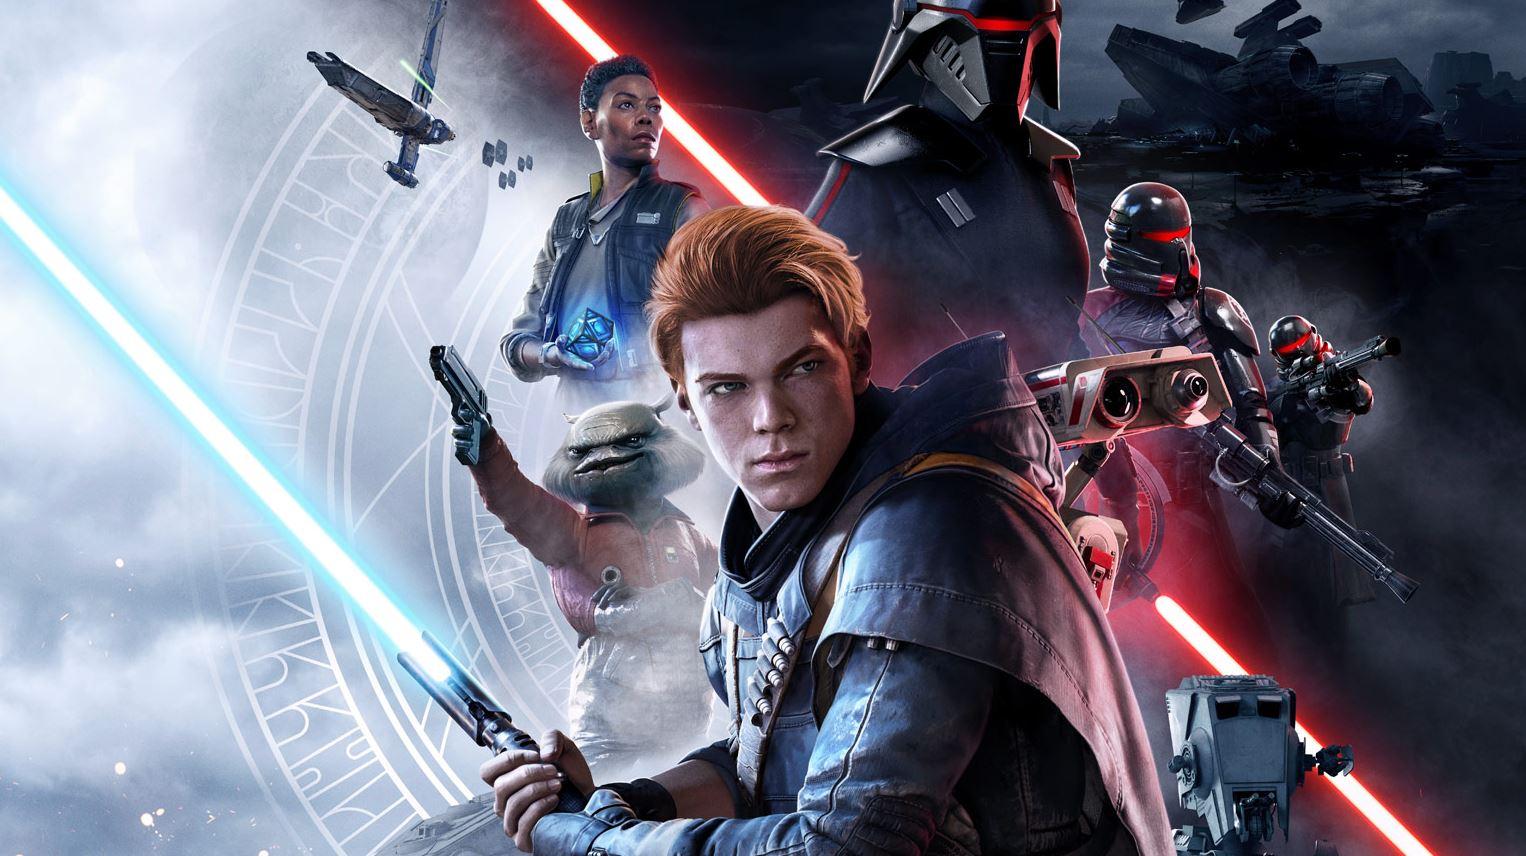 star-wars-jedi-fallen-order-update-released-providing-ps5-optimisation-and-improvements